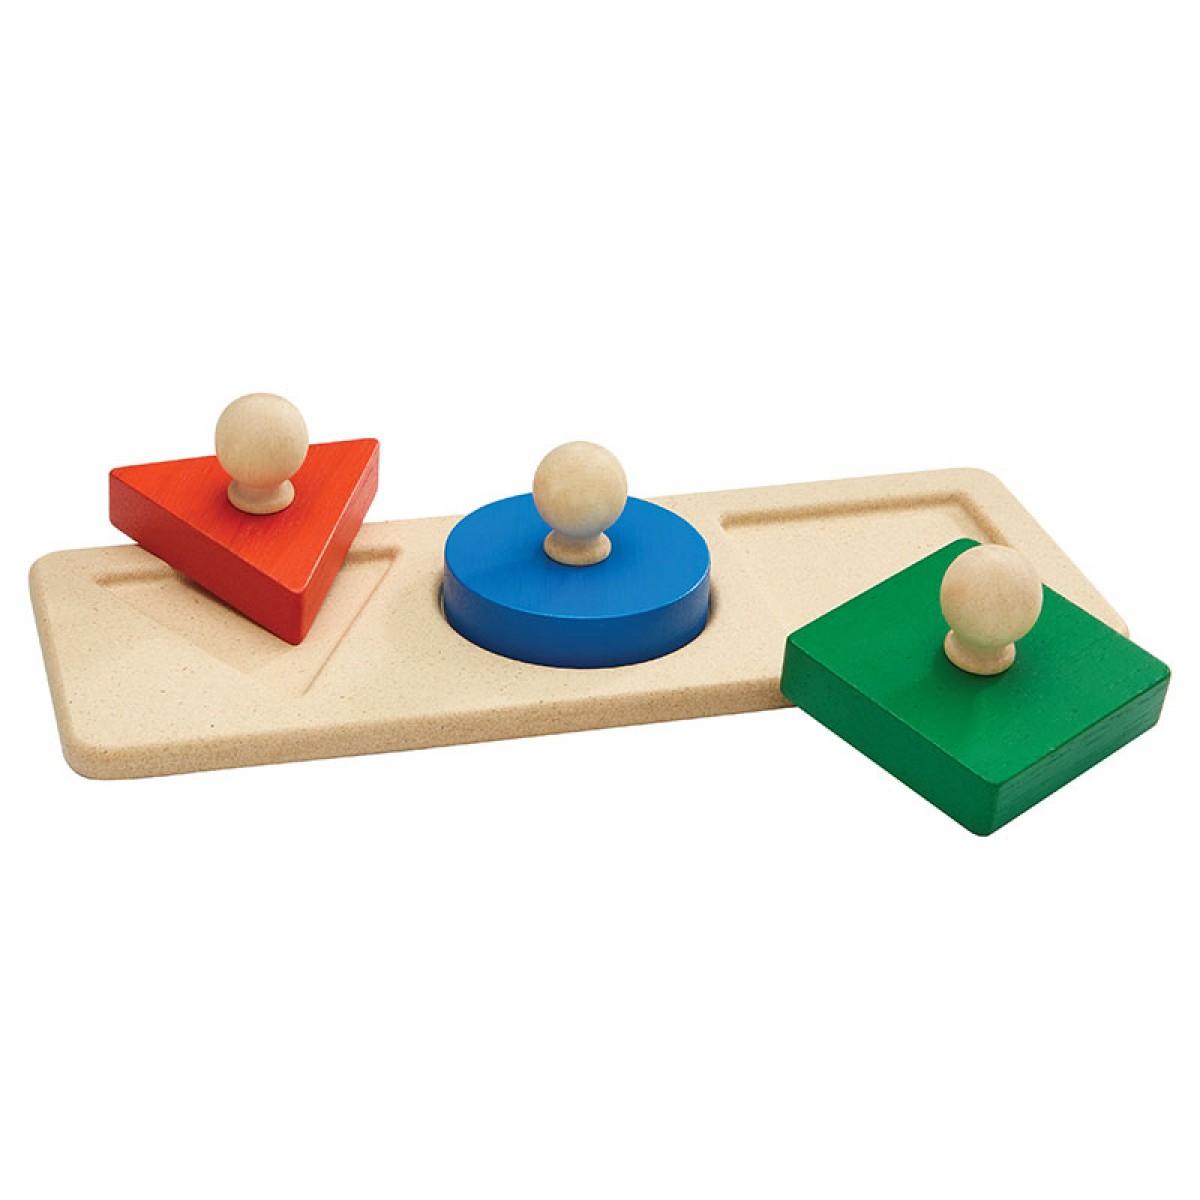 Plan Toys Παζλ με Σχήματα Ξύλινο